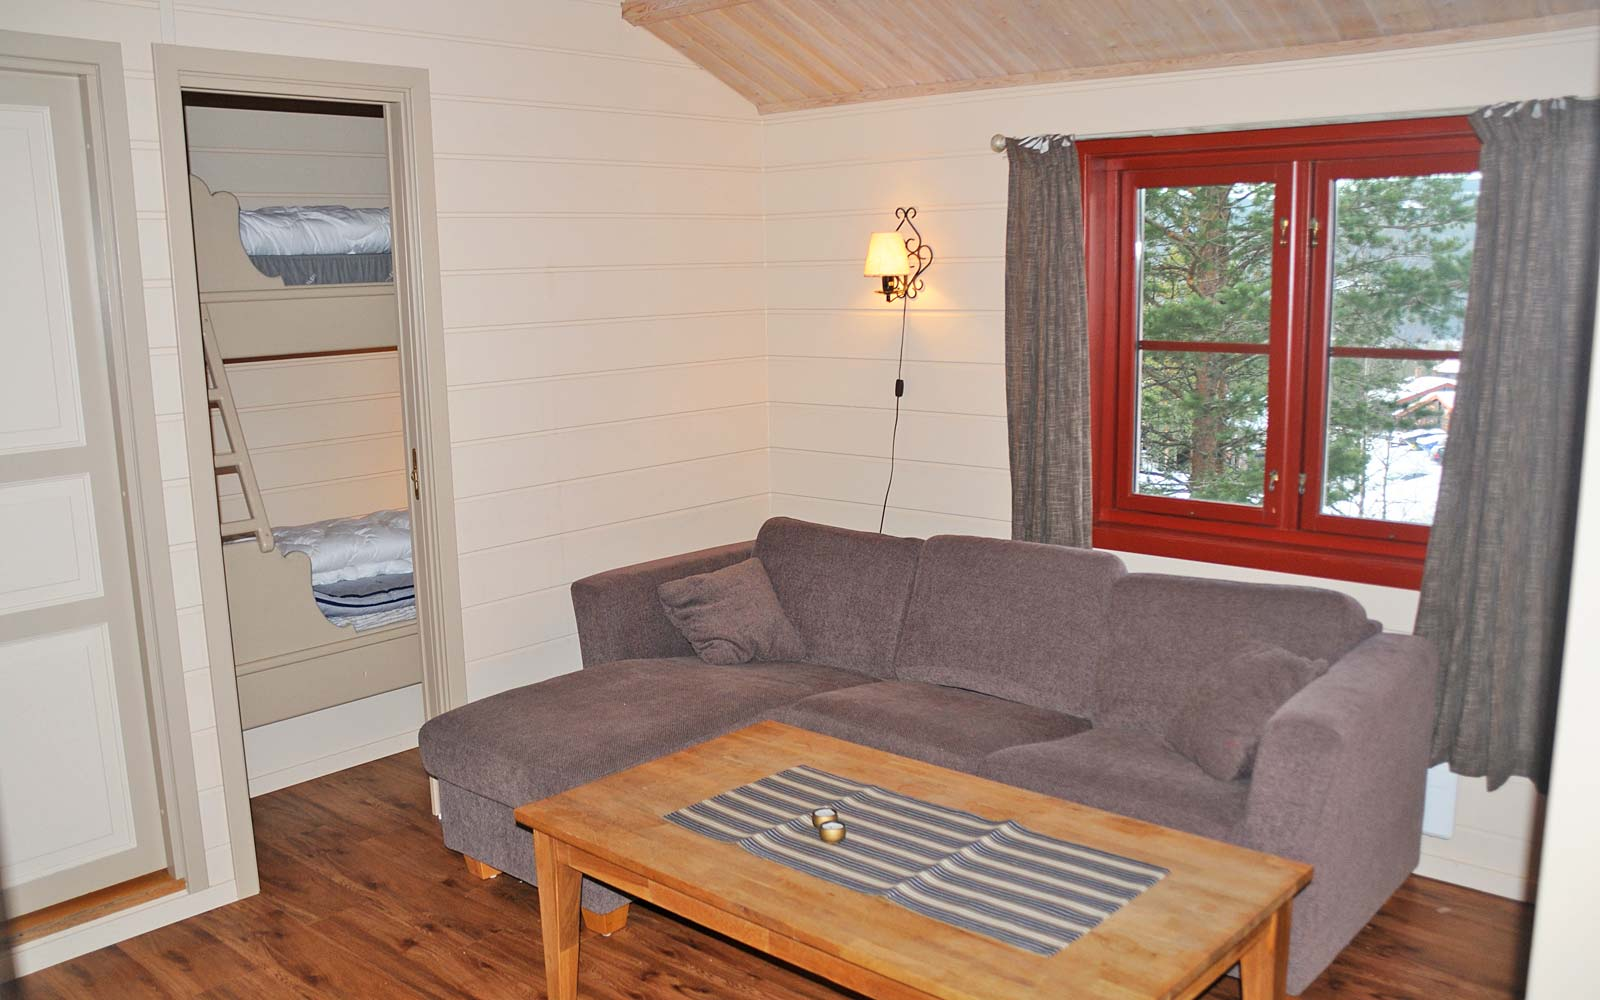 Stue leilighet Risbiten Sjumilskogen booking Trysil